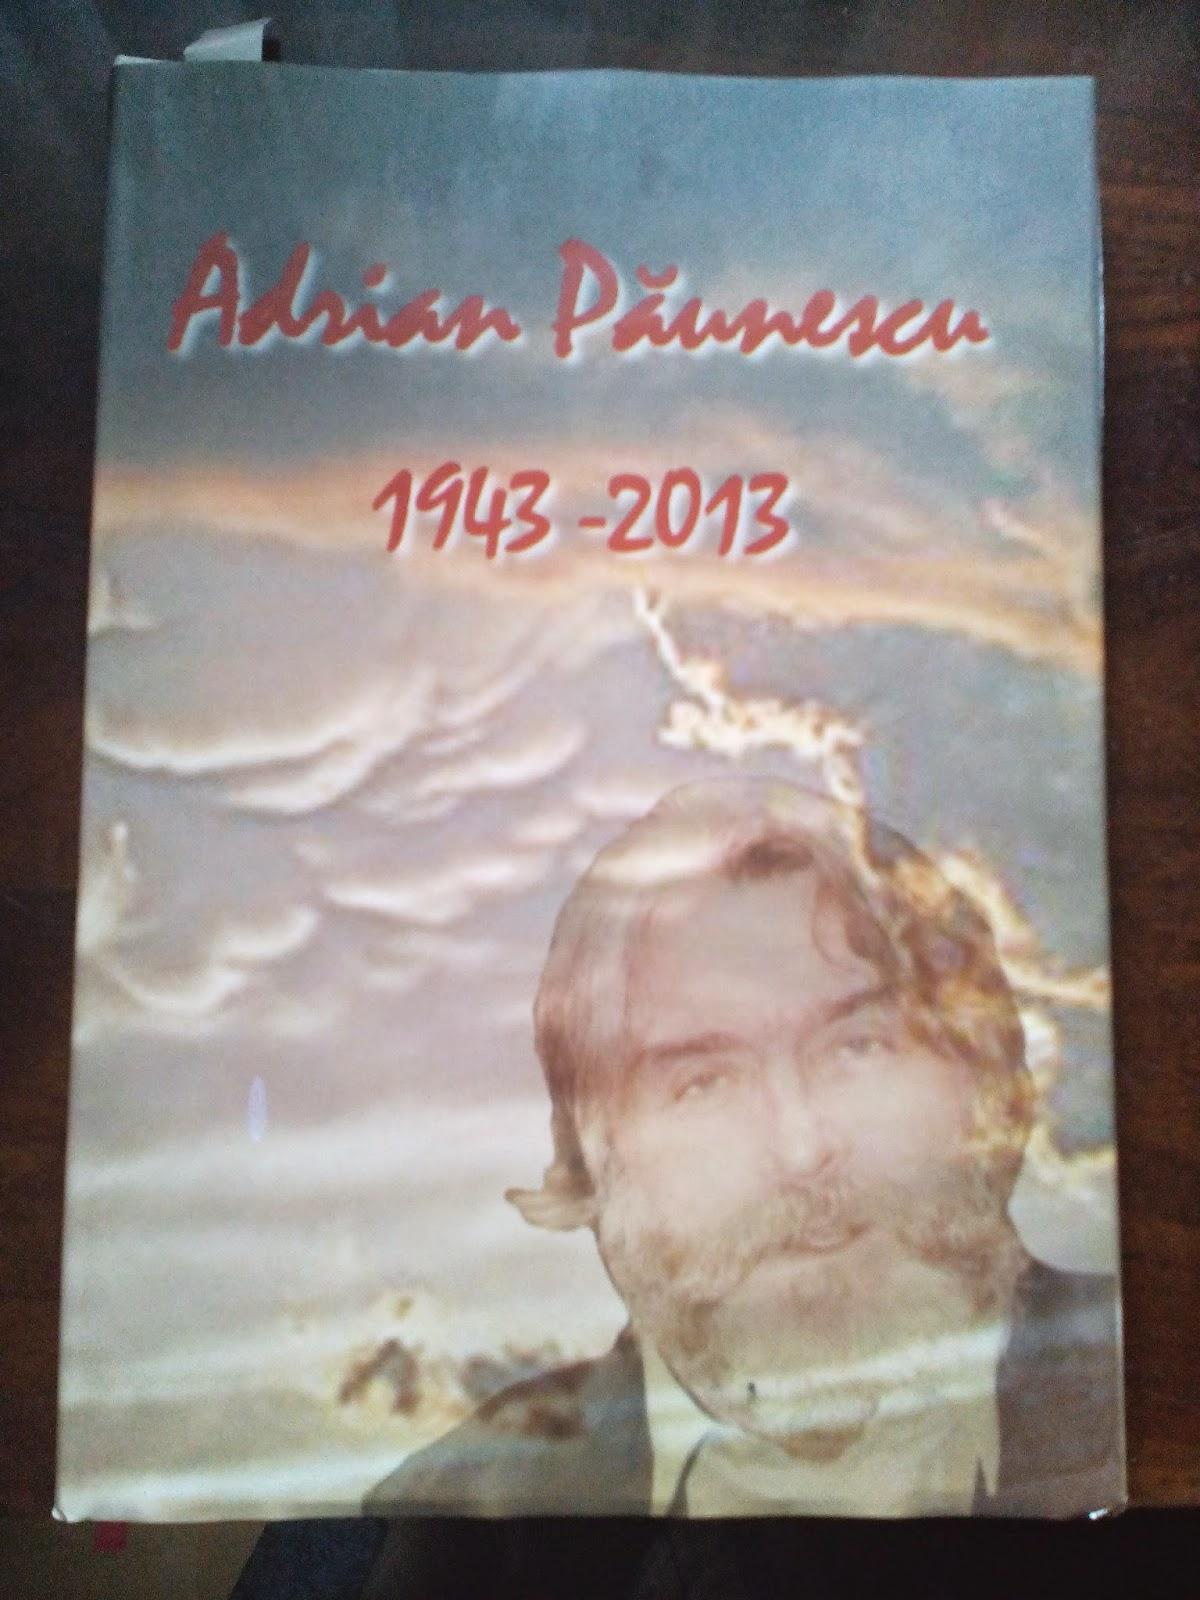 Tudor Nedelcea - Adrian Paunescu, 1943-2013